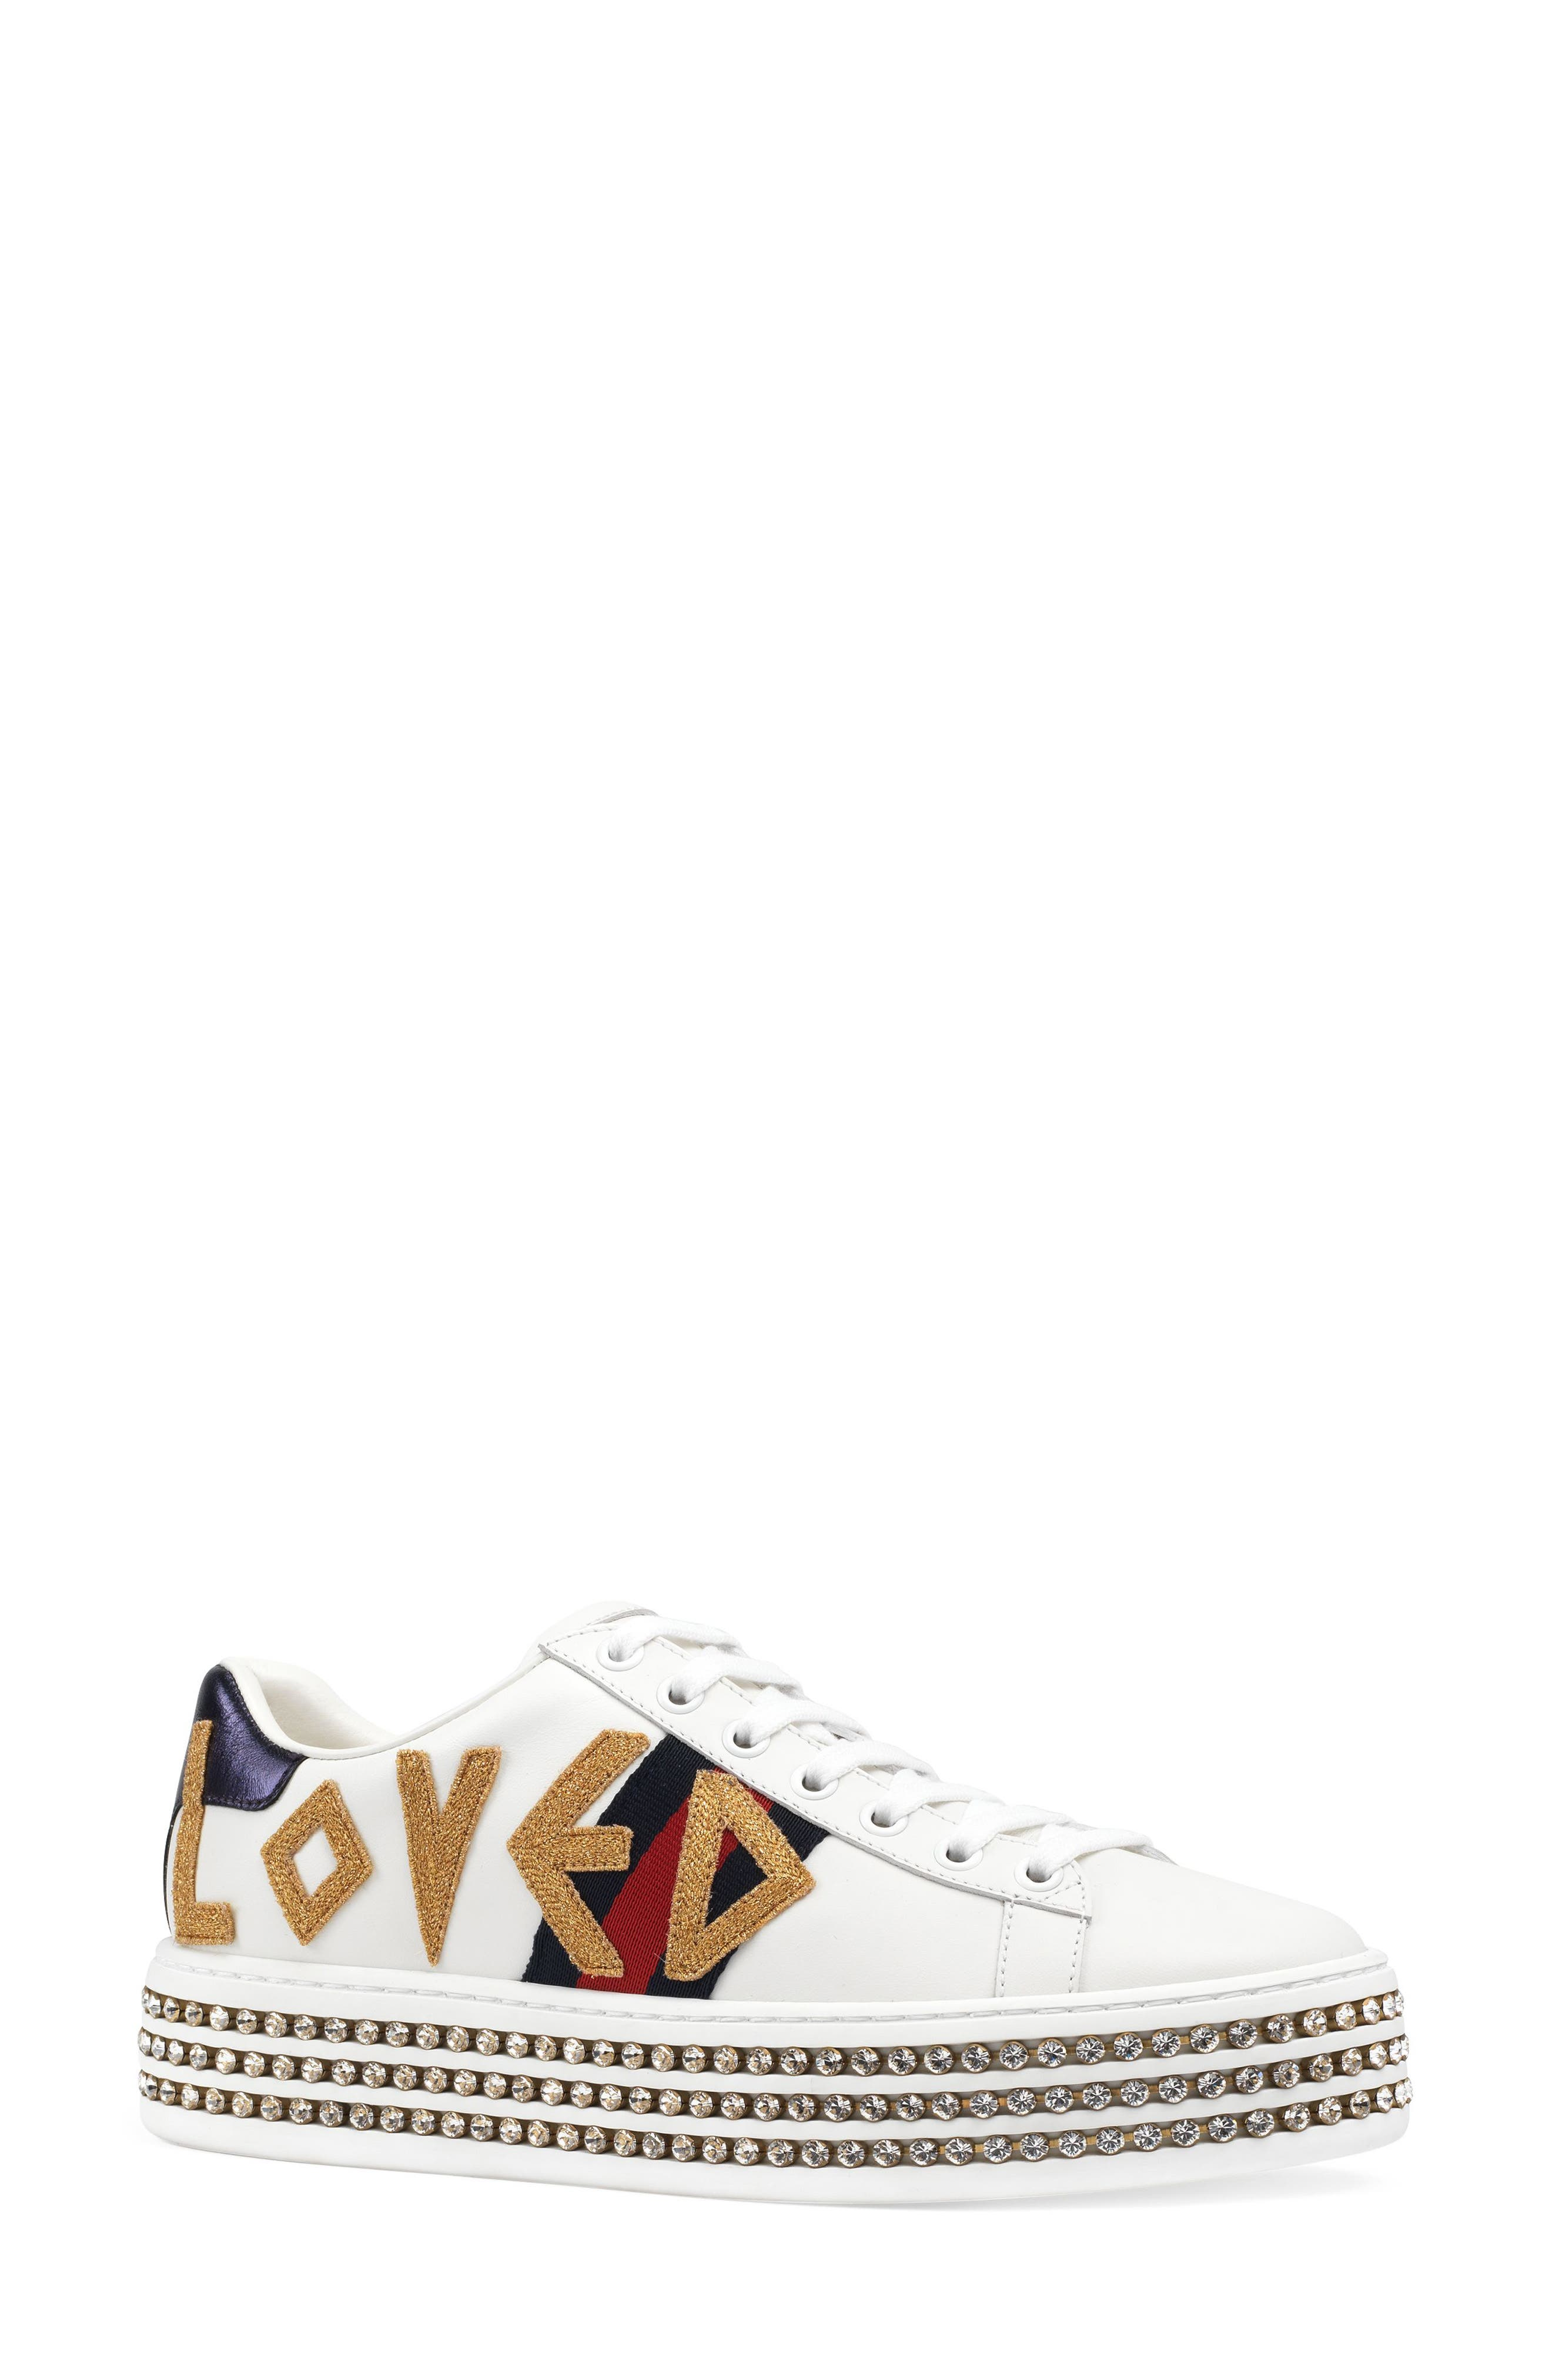 Alternate Image 1 Selected - Gucci New Ace Crystal Embellished Flatform Sneaker (Women)